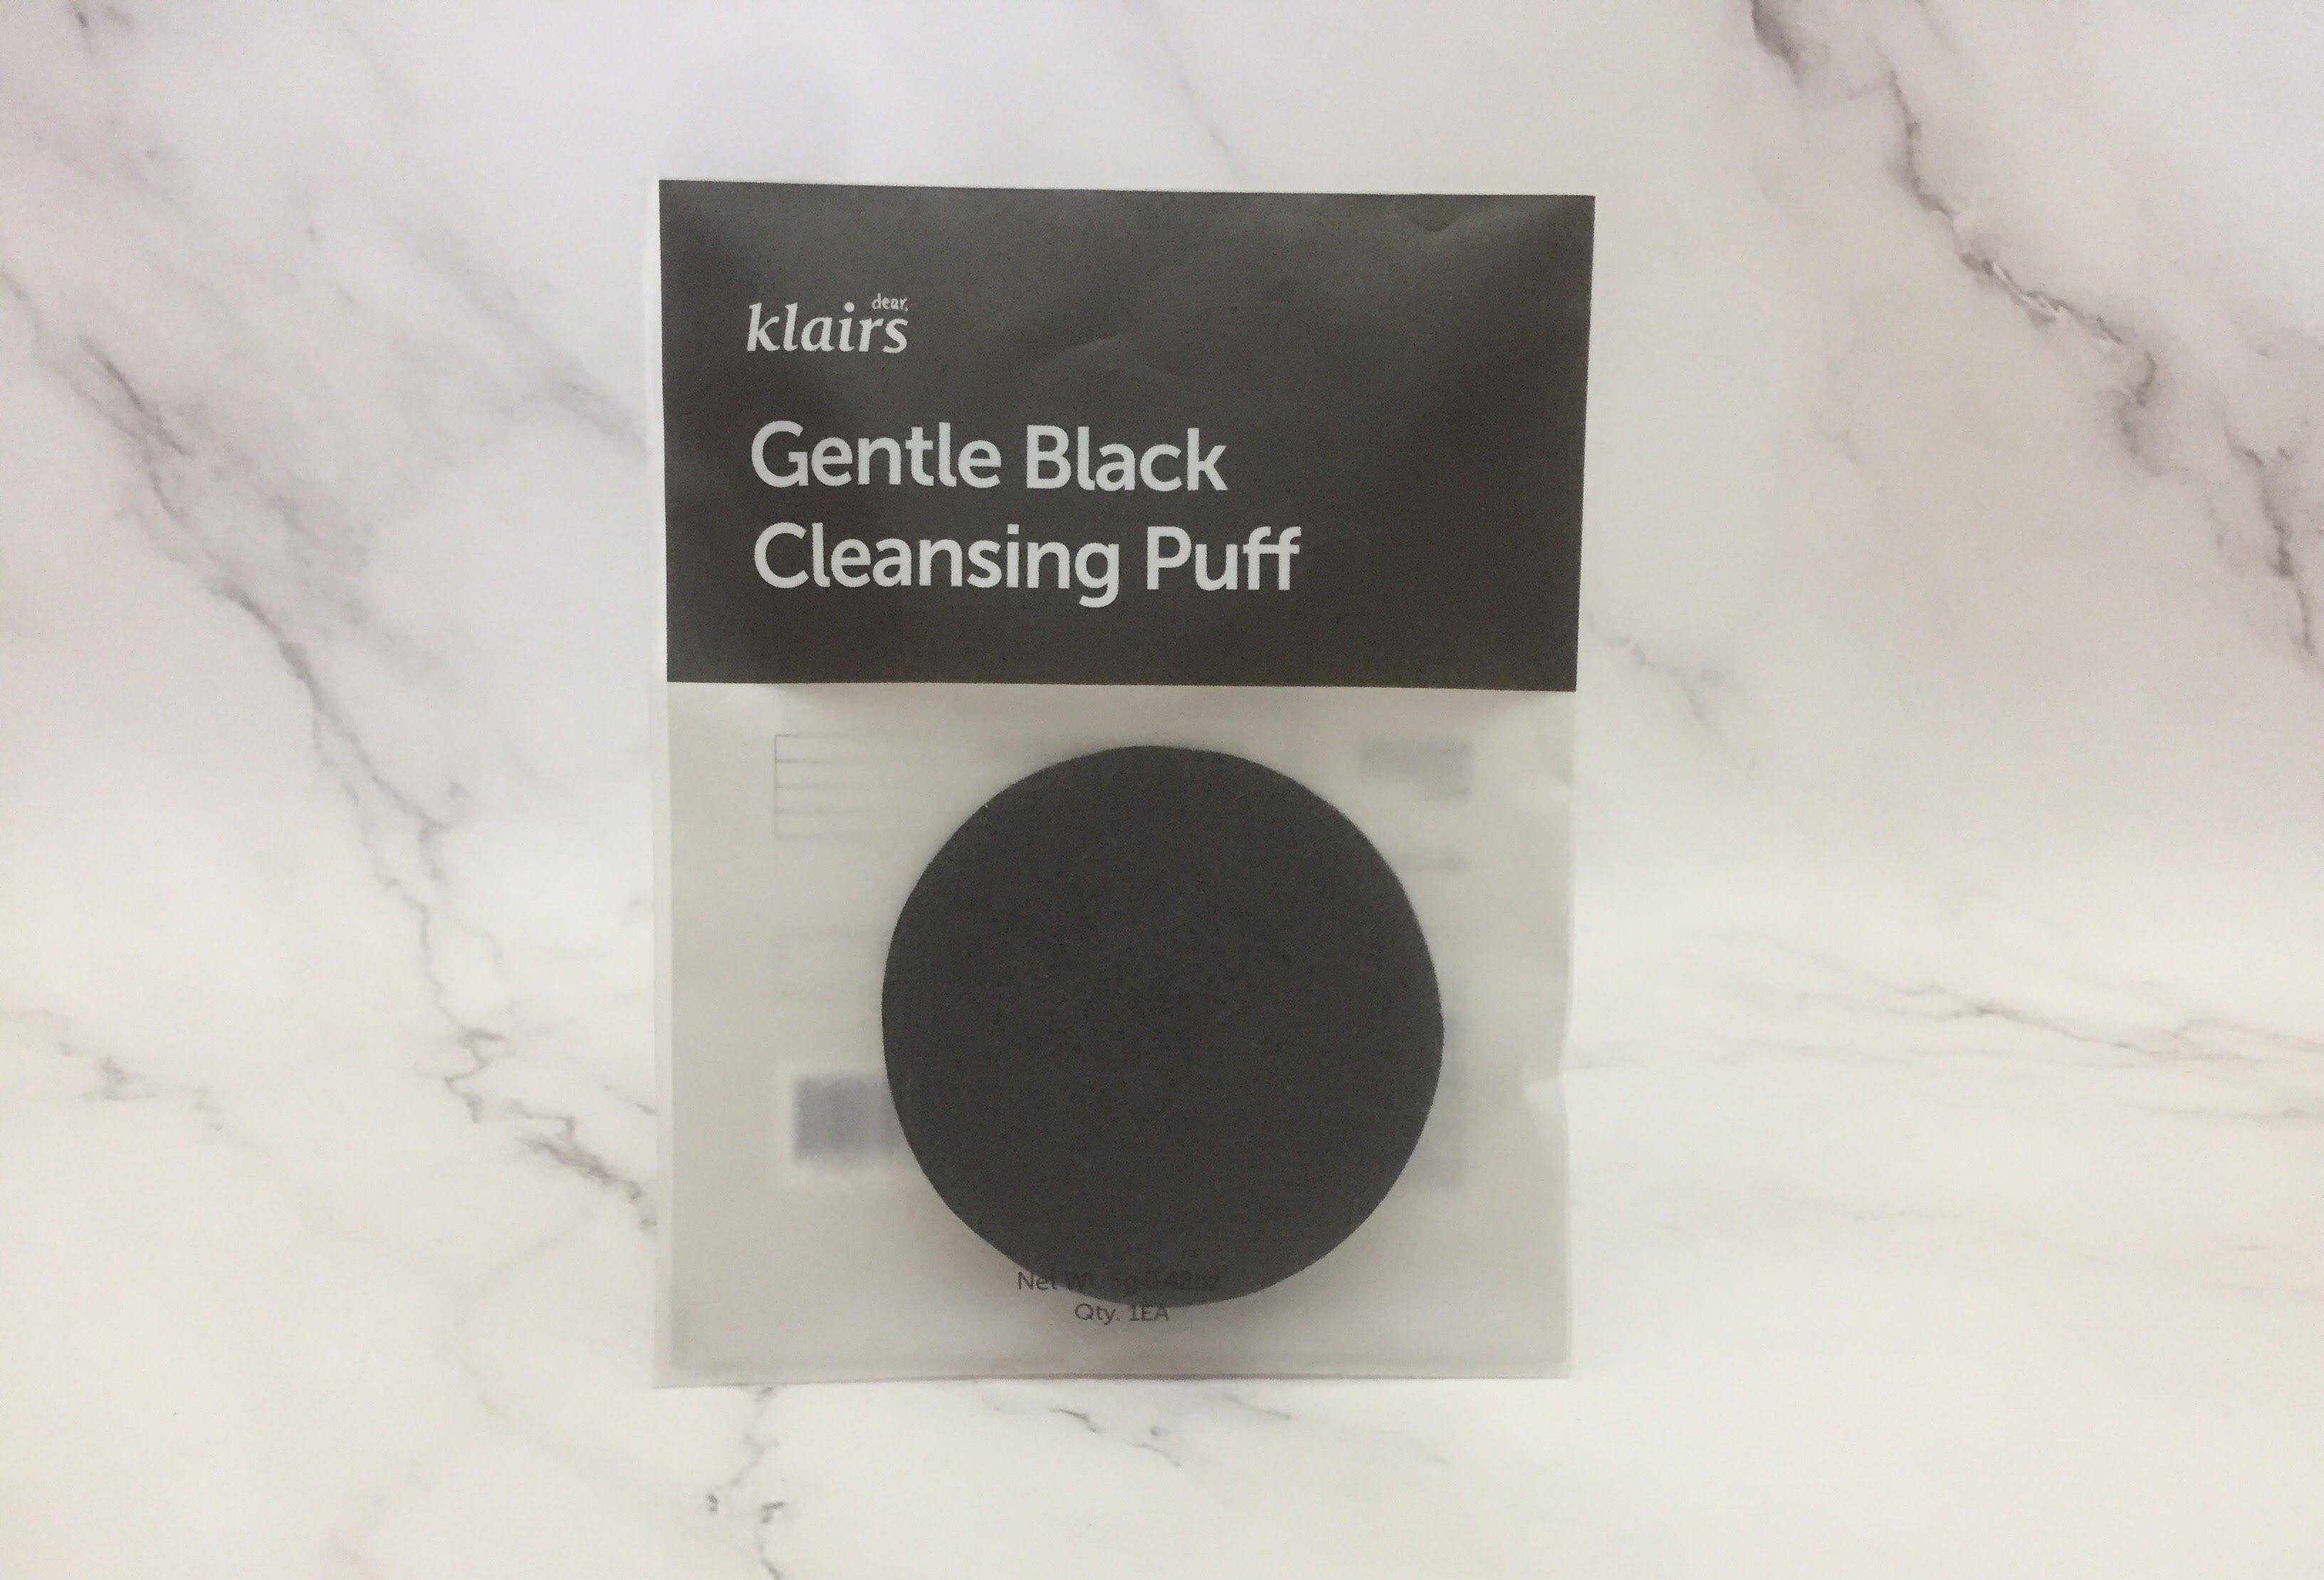 REVIEW | Klairs Gentle Black Cleansing Puff